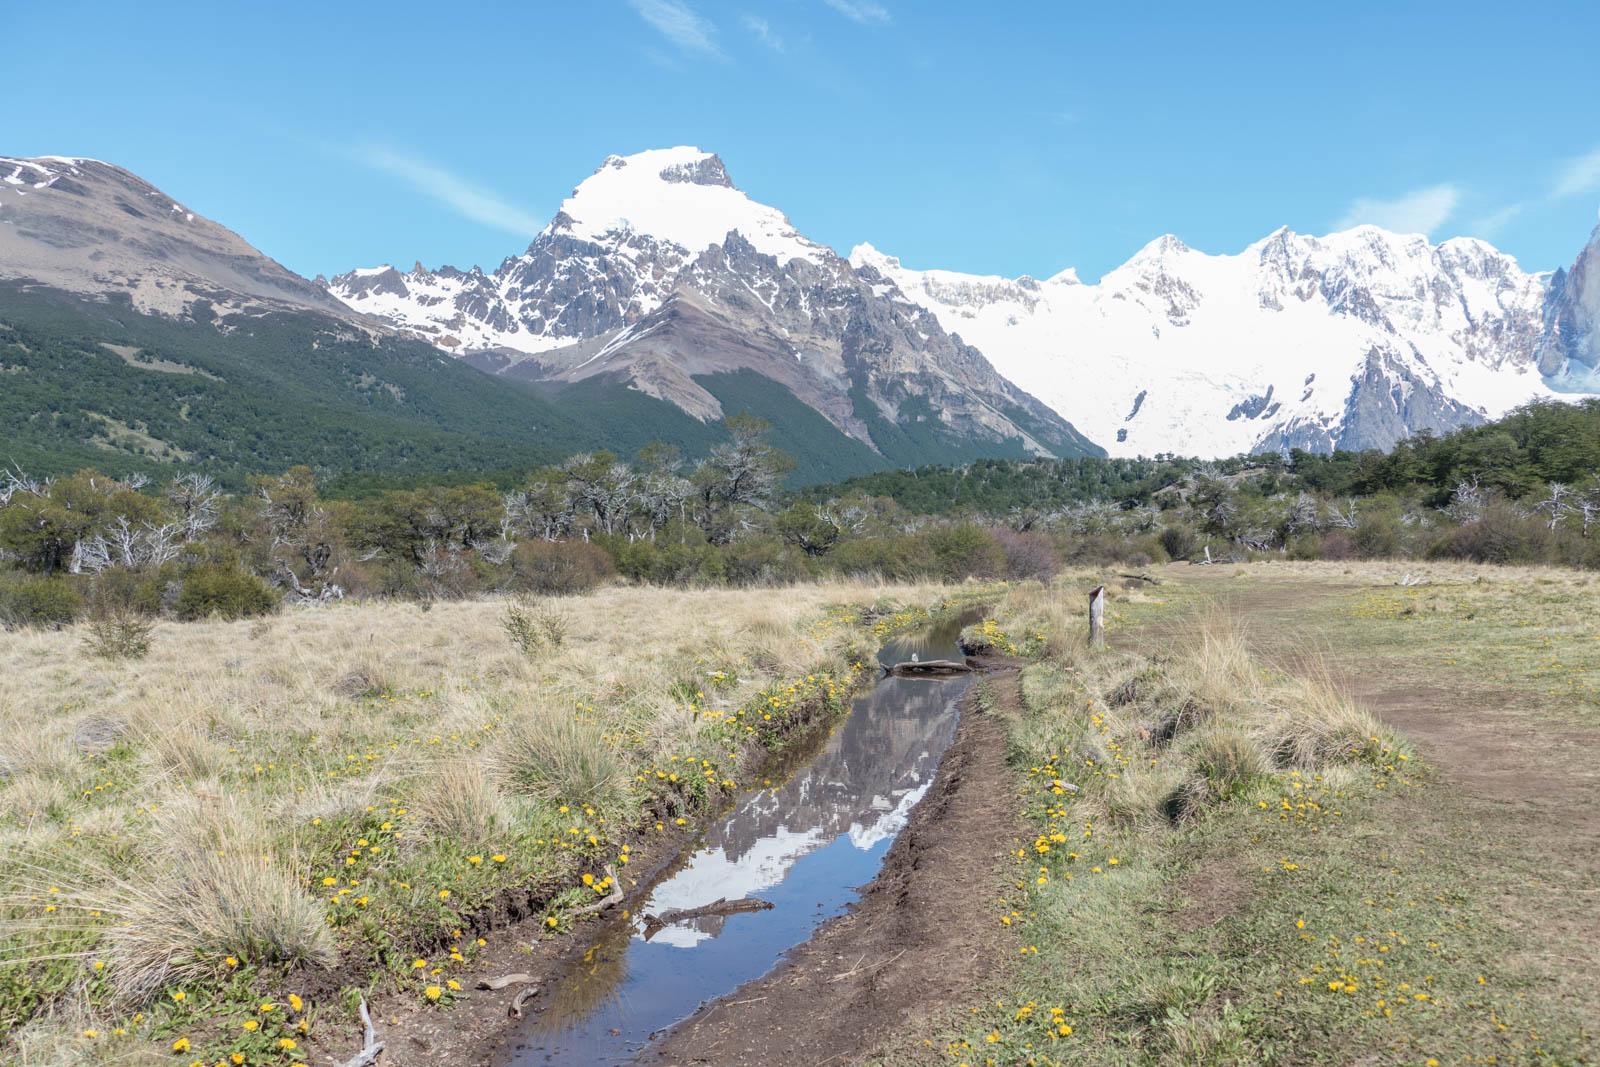 On the hike to Laguna Torre